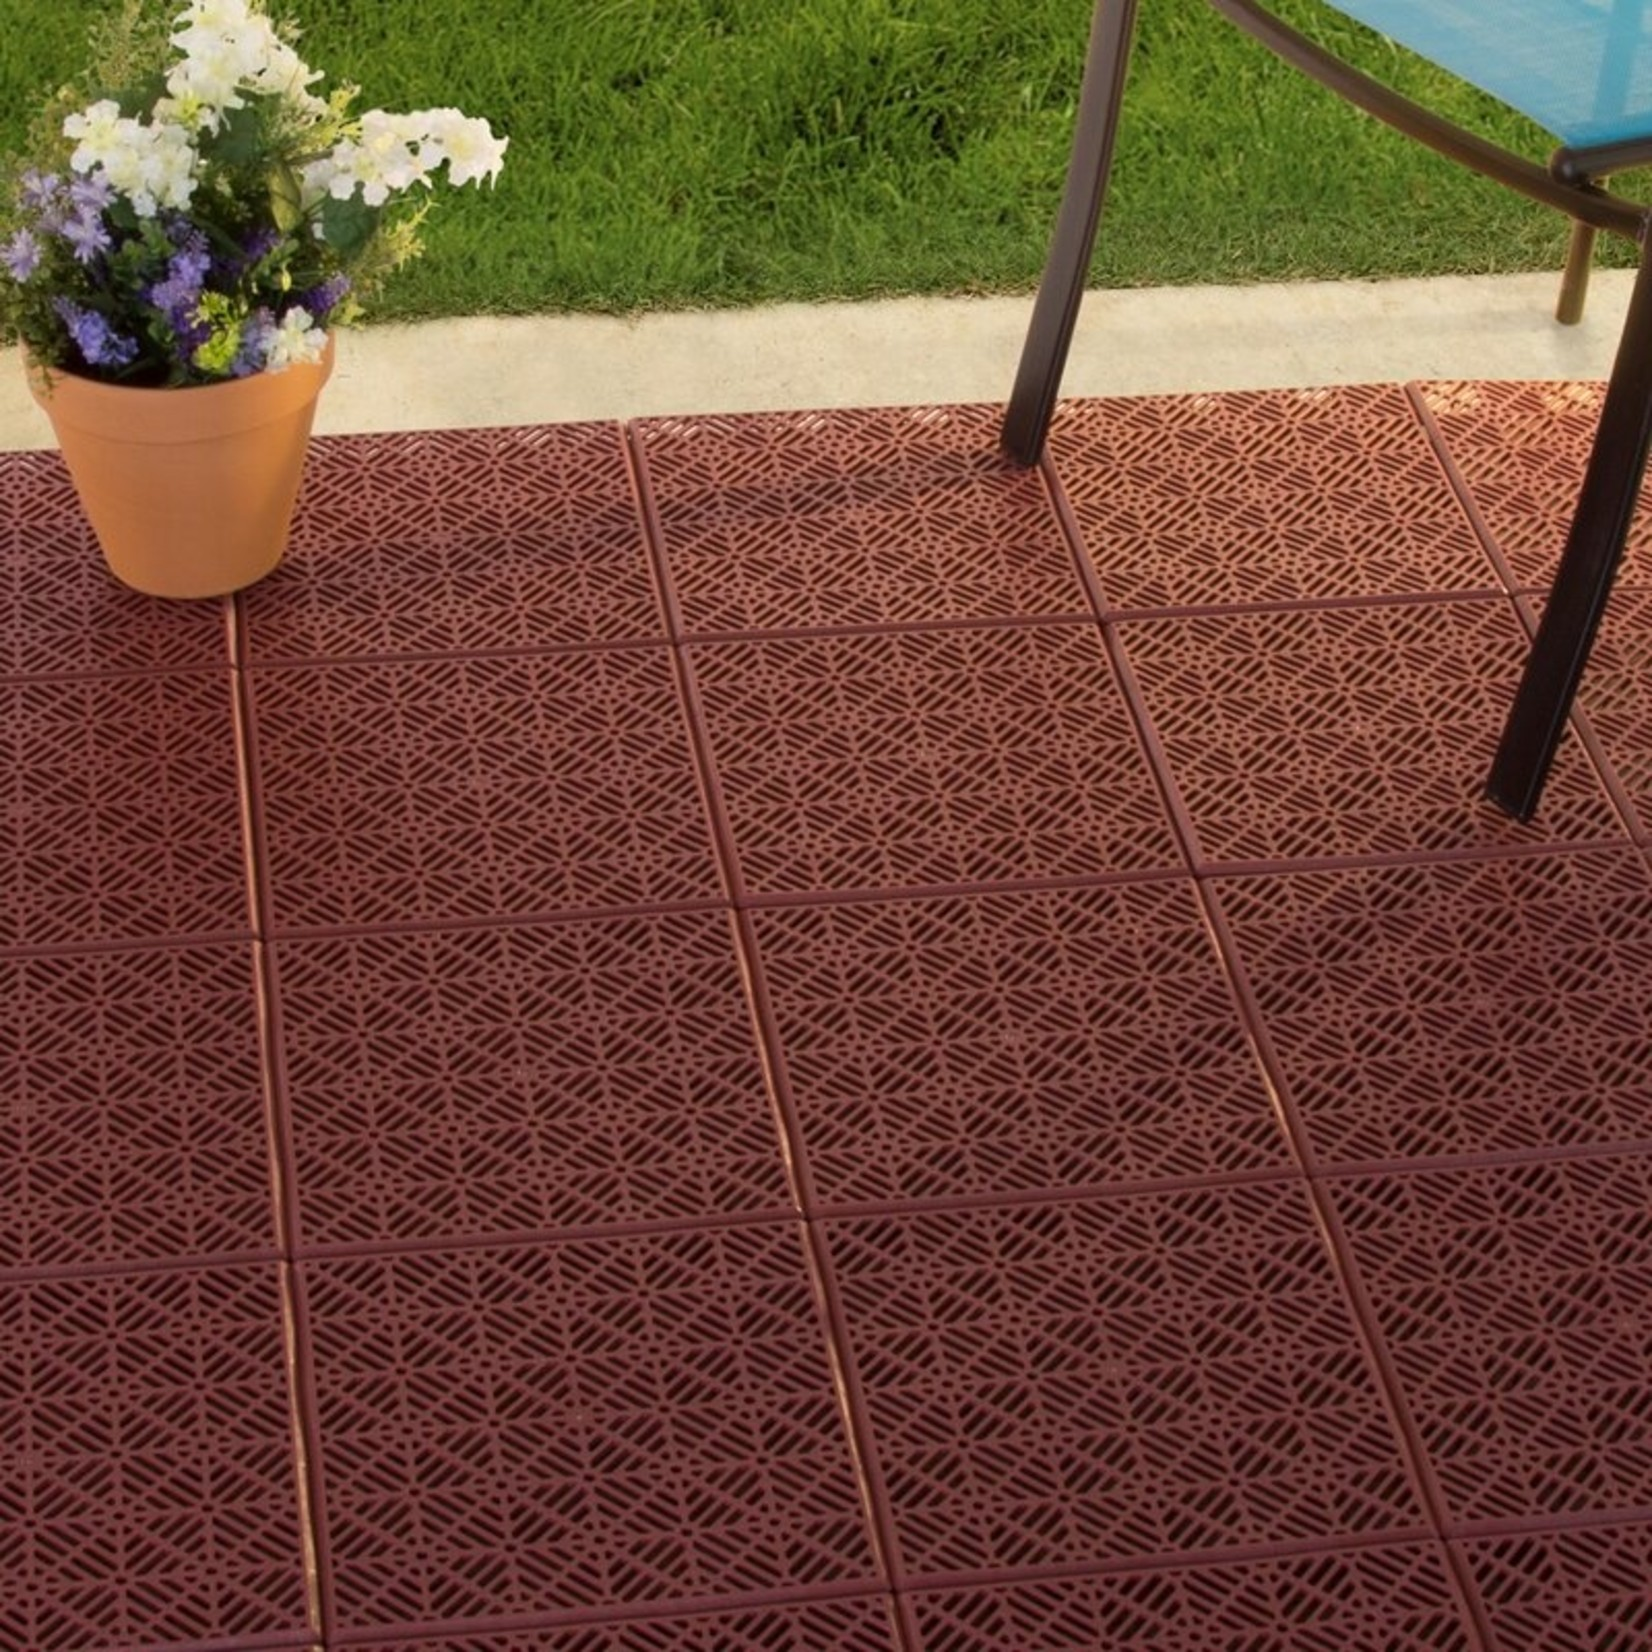 "*Patio 11.5"" x 11.5"" Plastic Interlocking Tile in Terracotta - Final Sale"